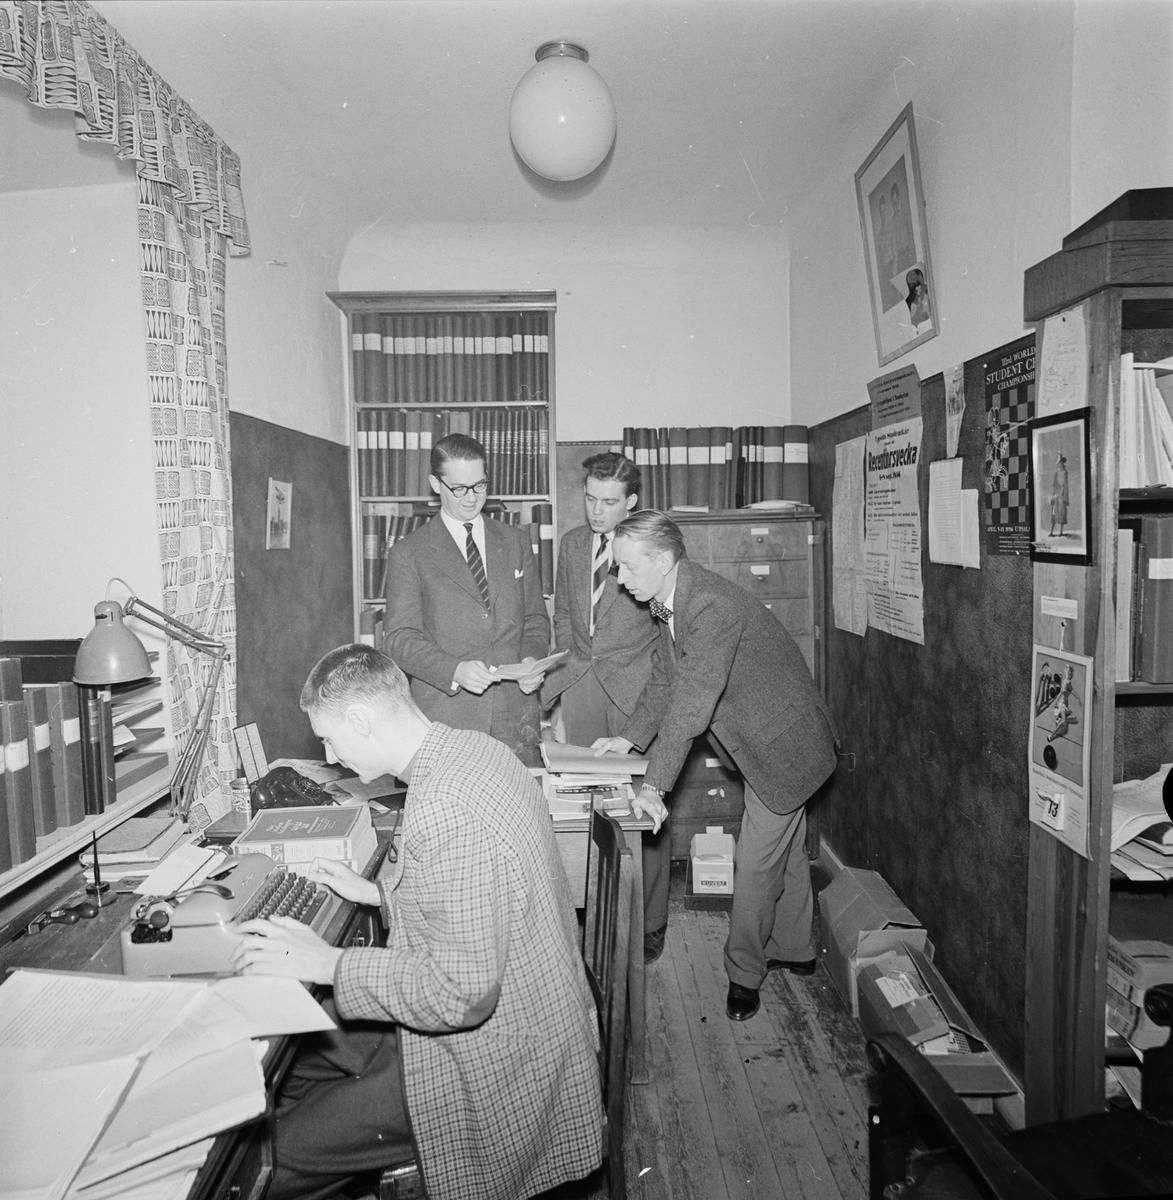 Studentkåren - expeditionslokalerna, Uppsala oktober 1956